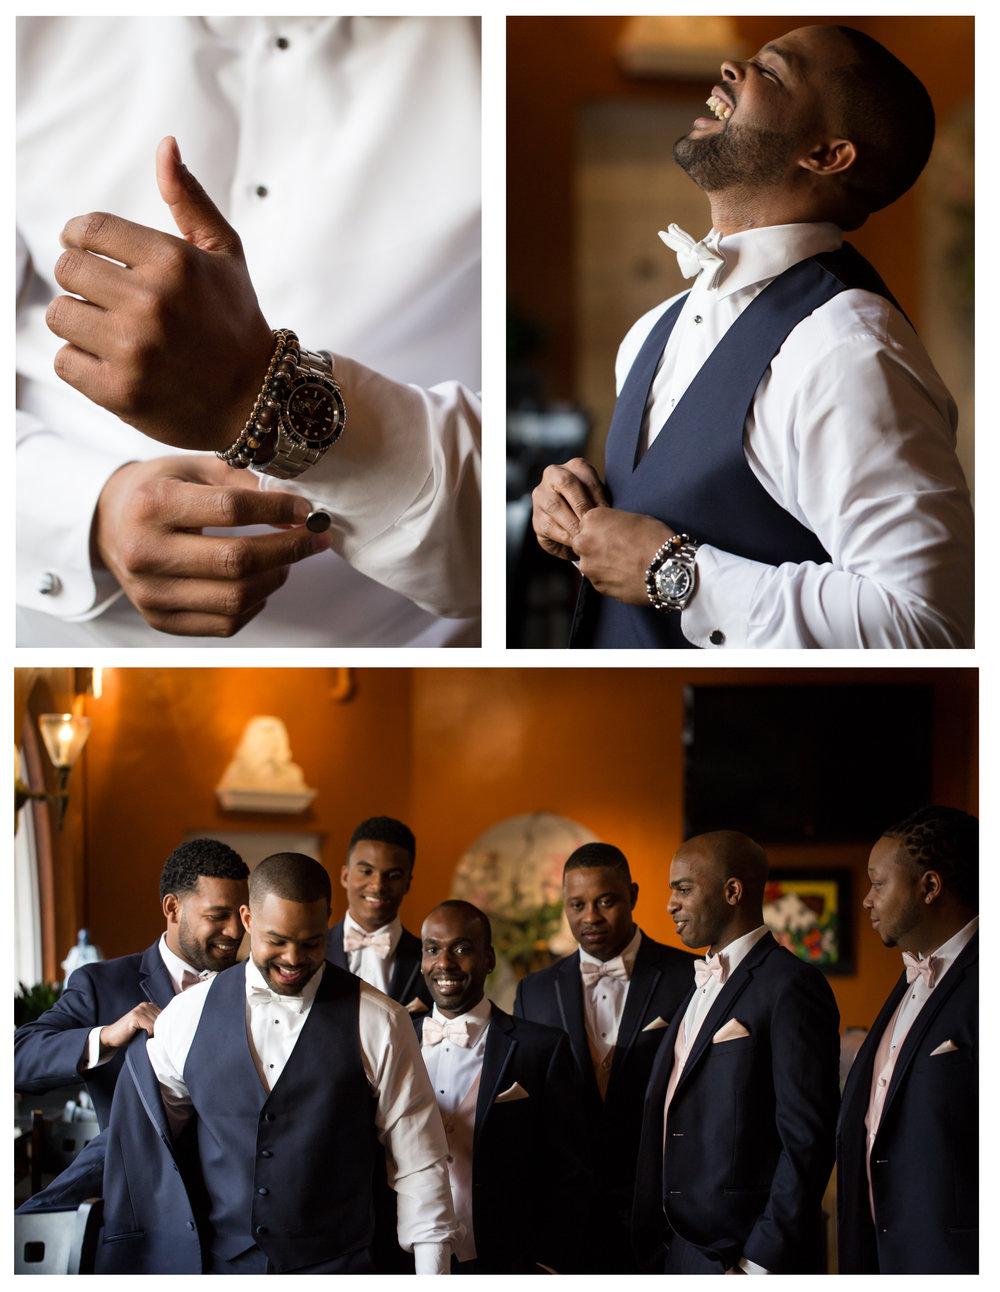 Benvenuto_wedding_Boynton_Beach_Jodi_Fjelde_Photography_Nikki_Otis_married_6.jpg